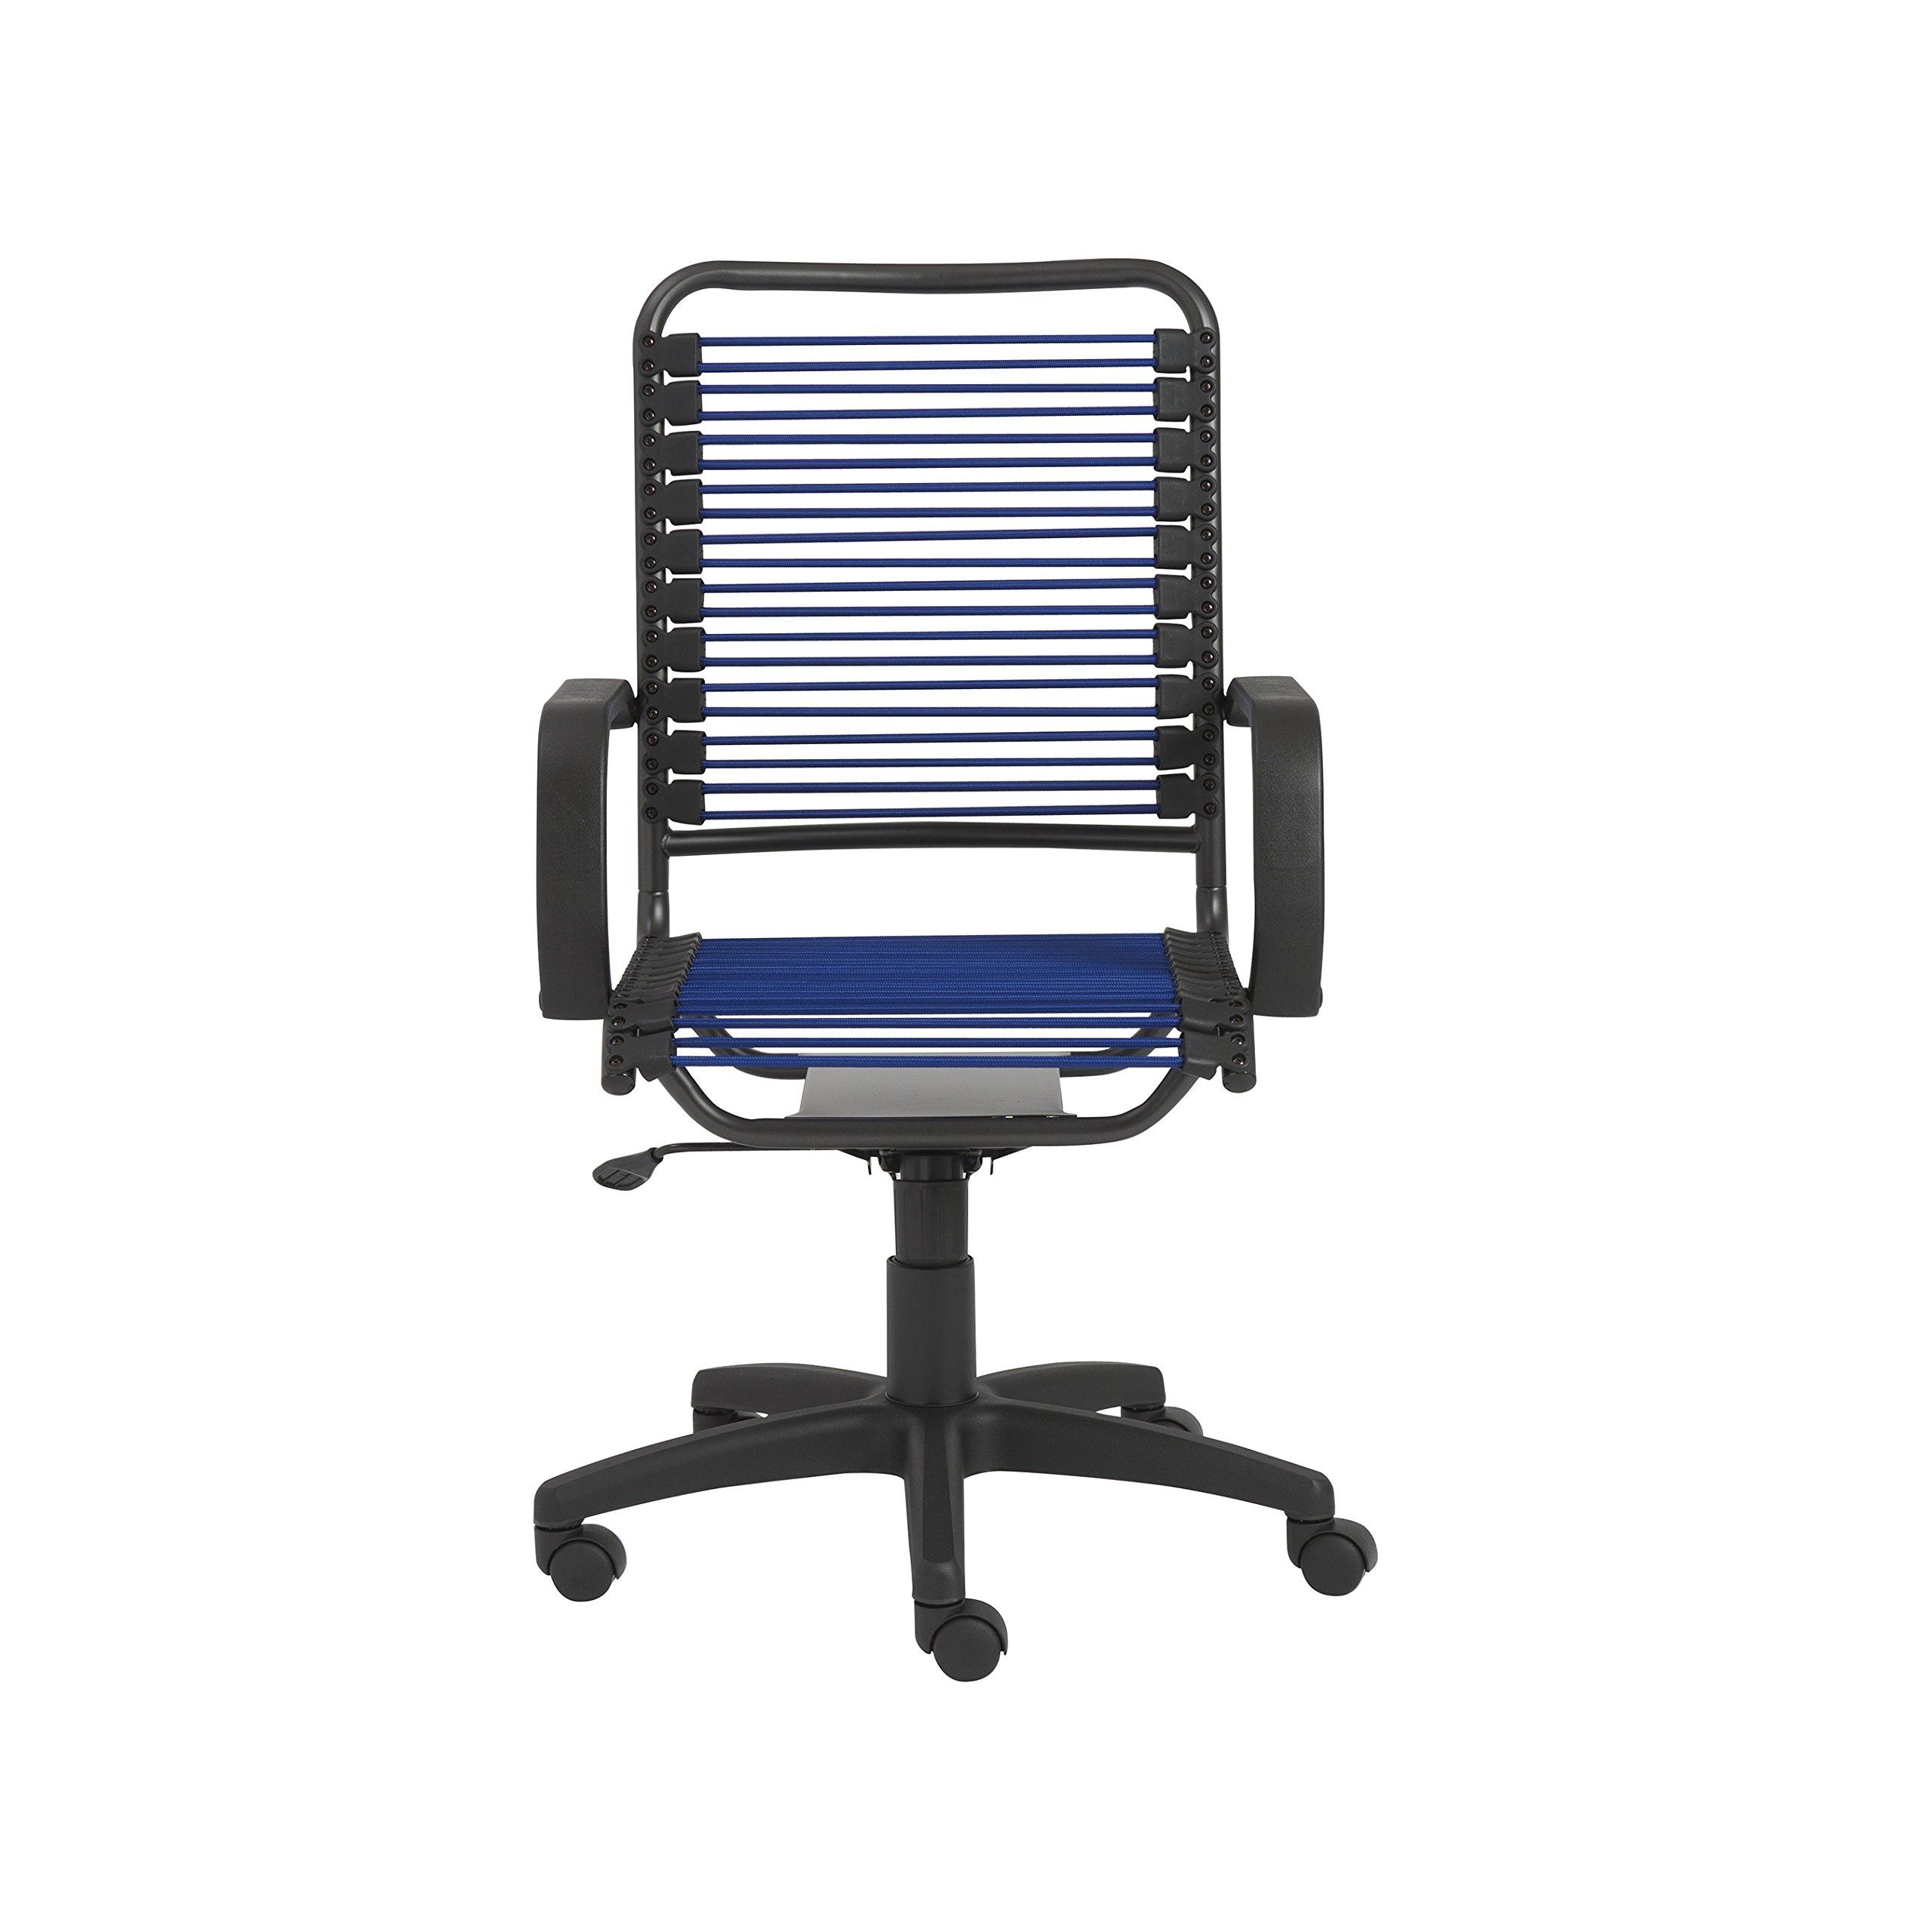 Eurø Style 02548BLU Bradley Bungie Office Chair, L: 27 W: 23 H: 37.5-43 SH: 17.5-23, Blue by Eurø Style